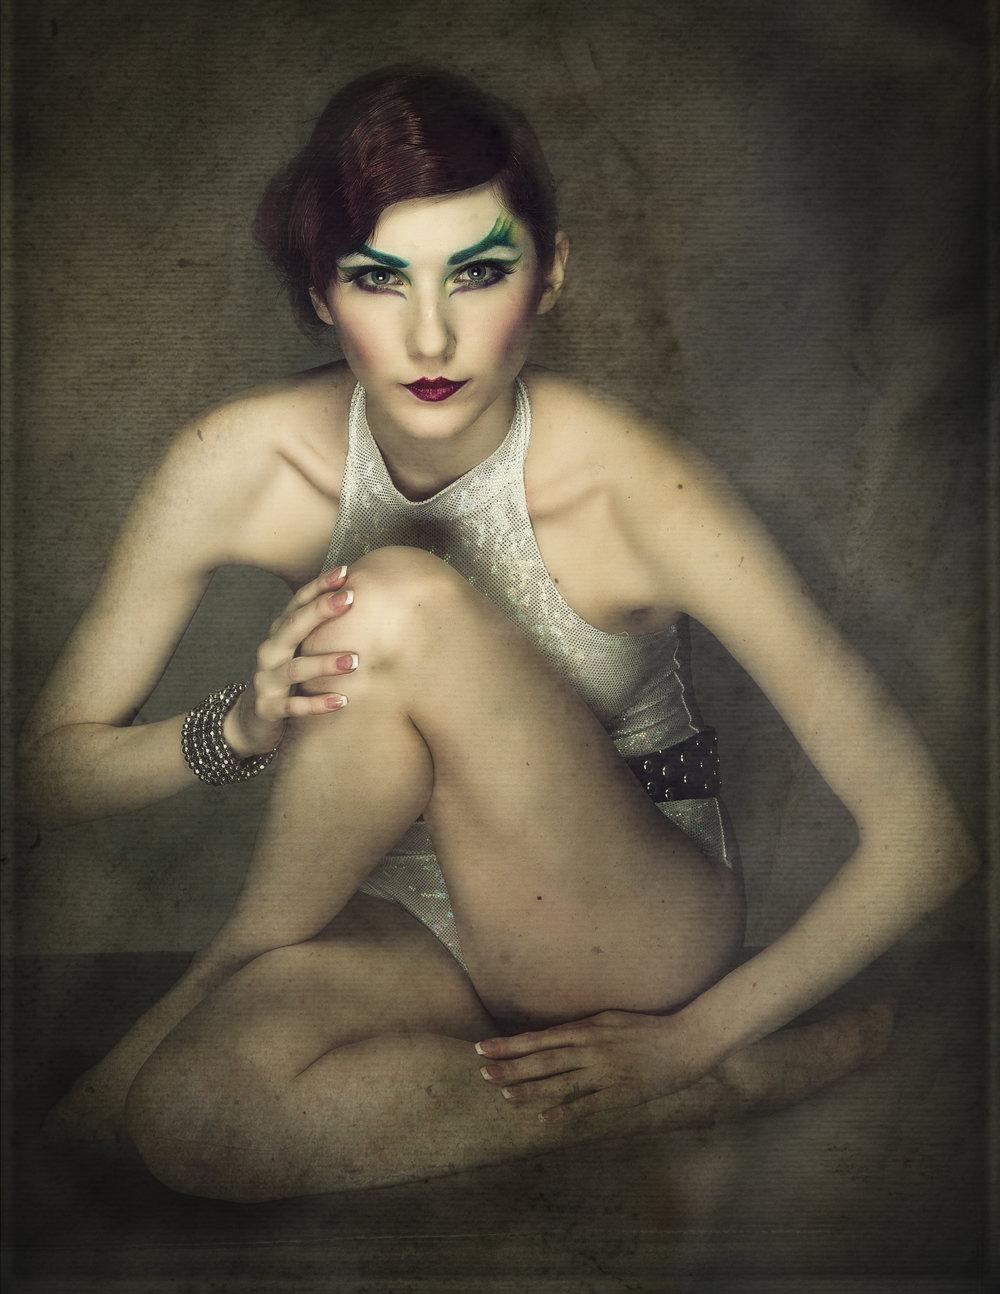 Photo by Christina Lazar-Schuler